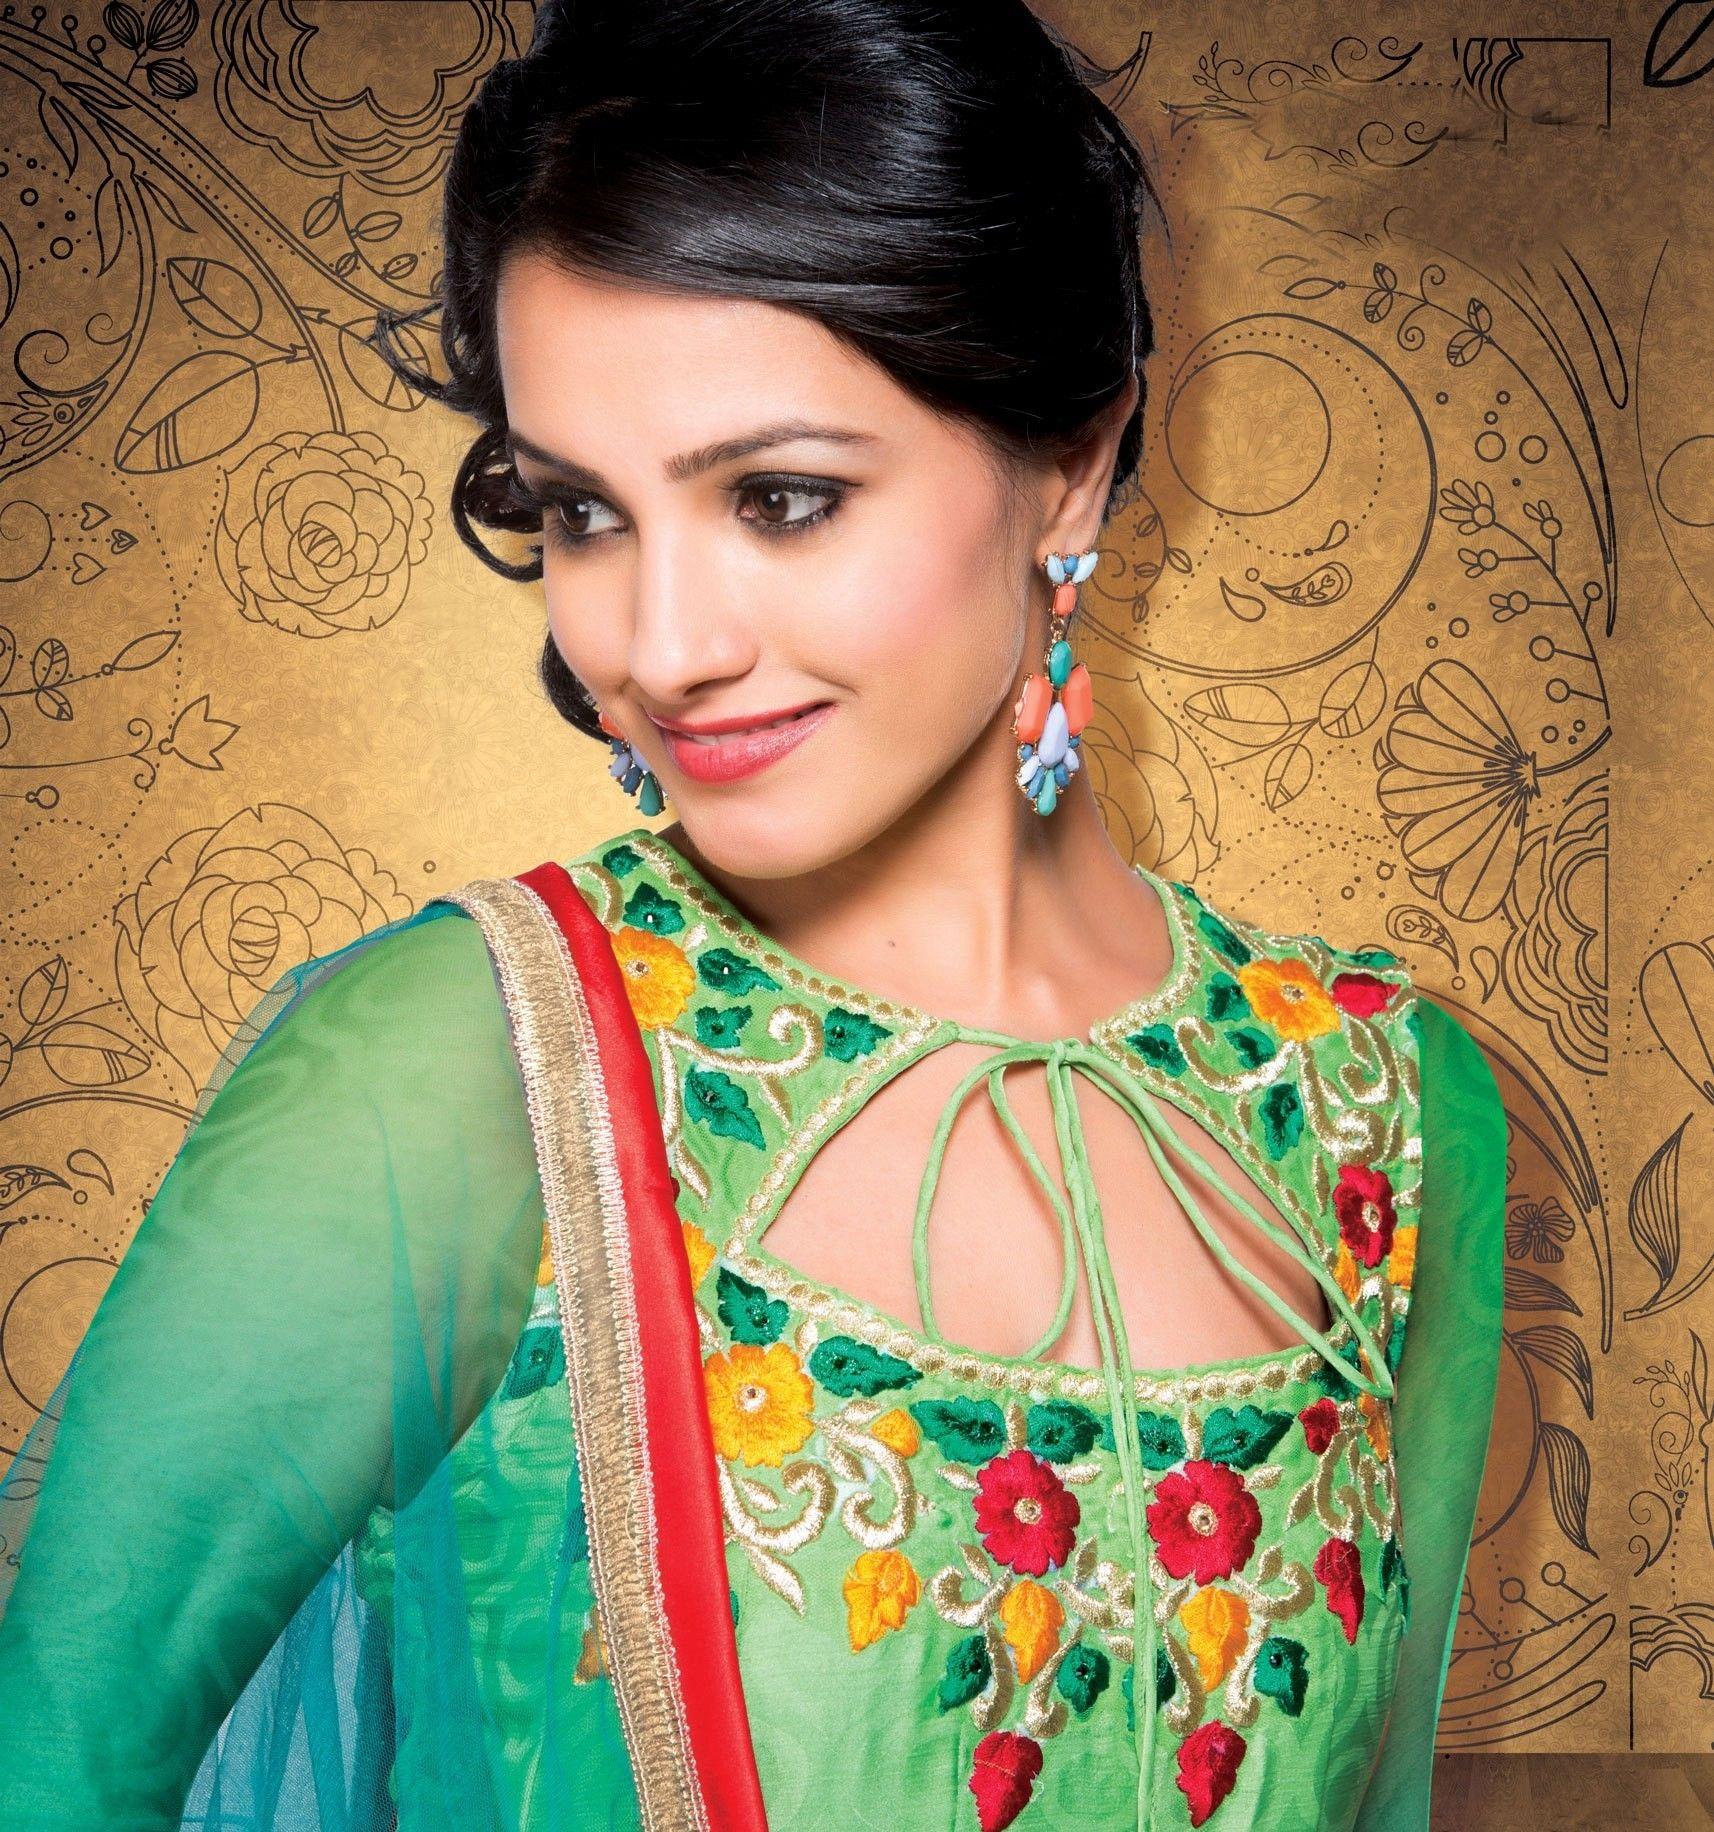 Anita Hassanandani Beautiful Hd Photos Mobile Wallpapers Hd Android Iphone 1080p 21750 Anitaha Indian Tv Actress Beautiful Indian Actress Celebrities